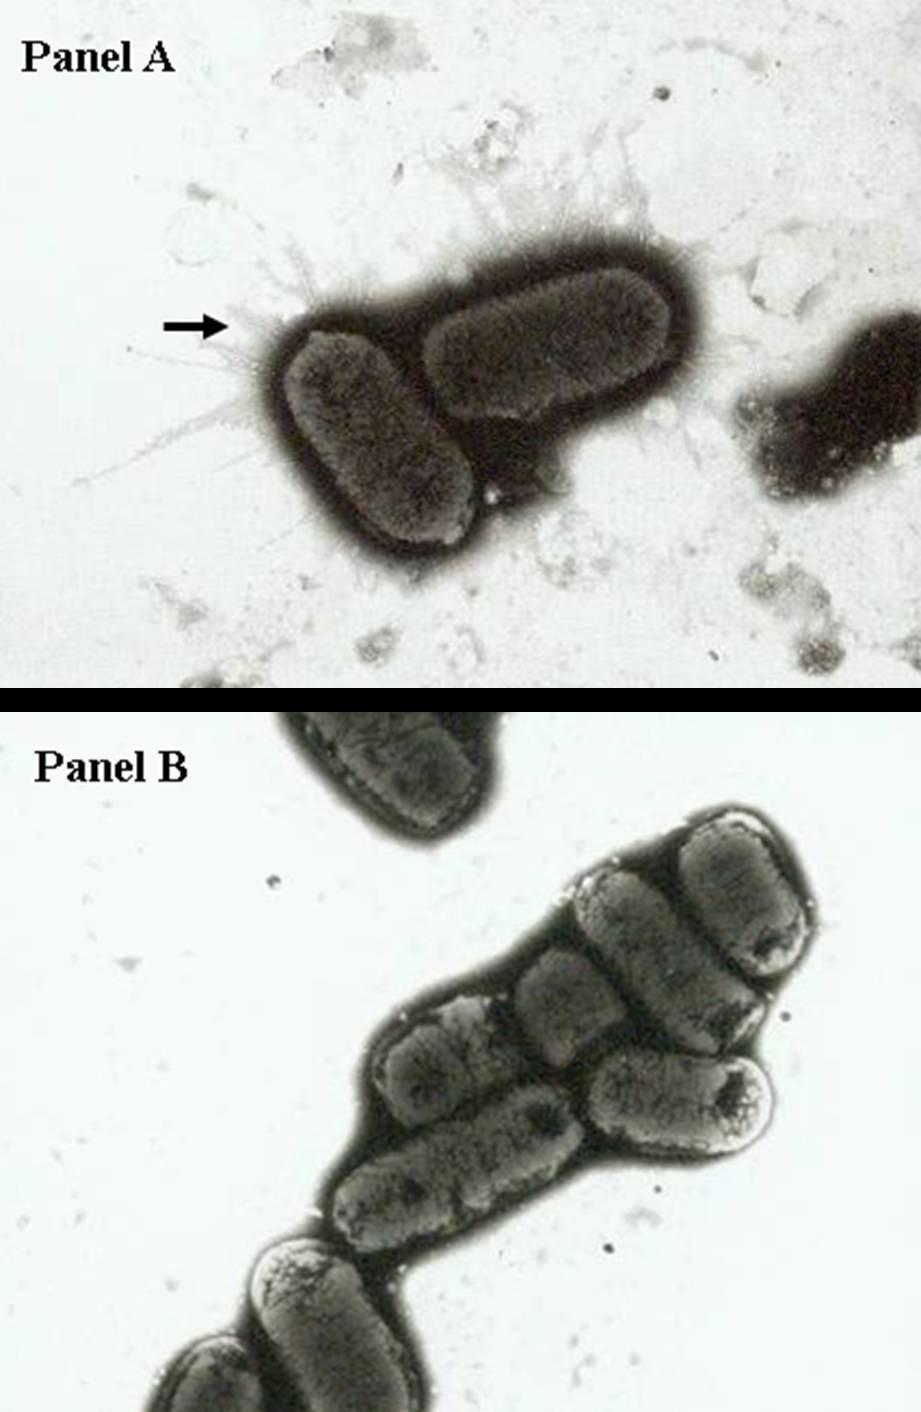 monophasic salmonella typhimurium Emergence of monophasic salmonella typhimurium in the us: looking through the minnesota vdl keyhole - dr julio alvarez, from the 2016 allen d leman swine.